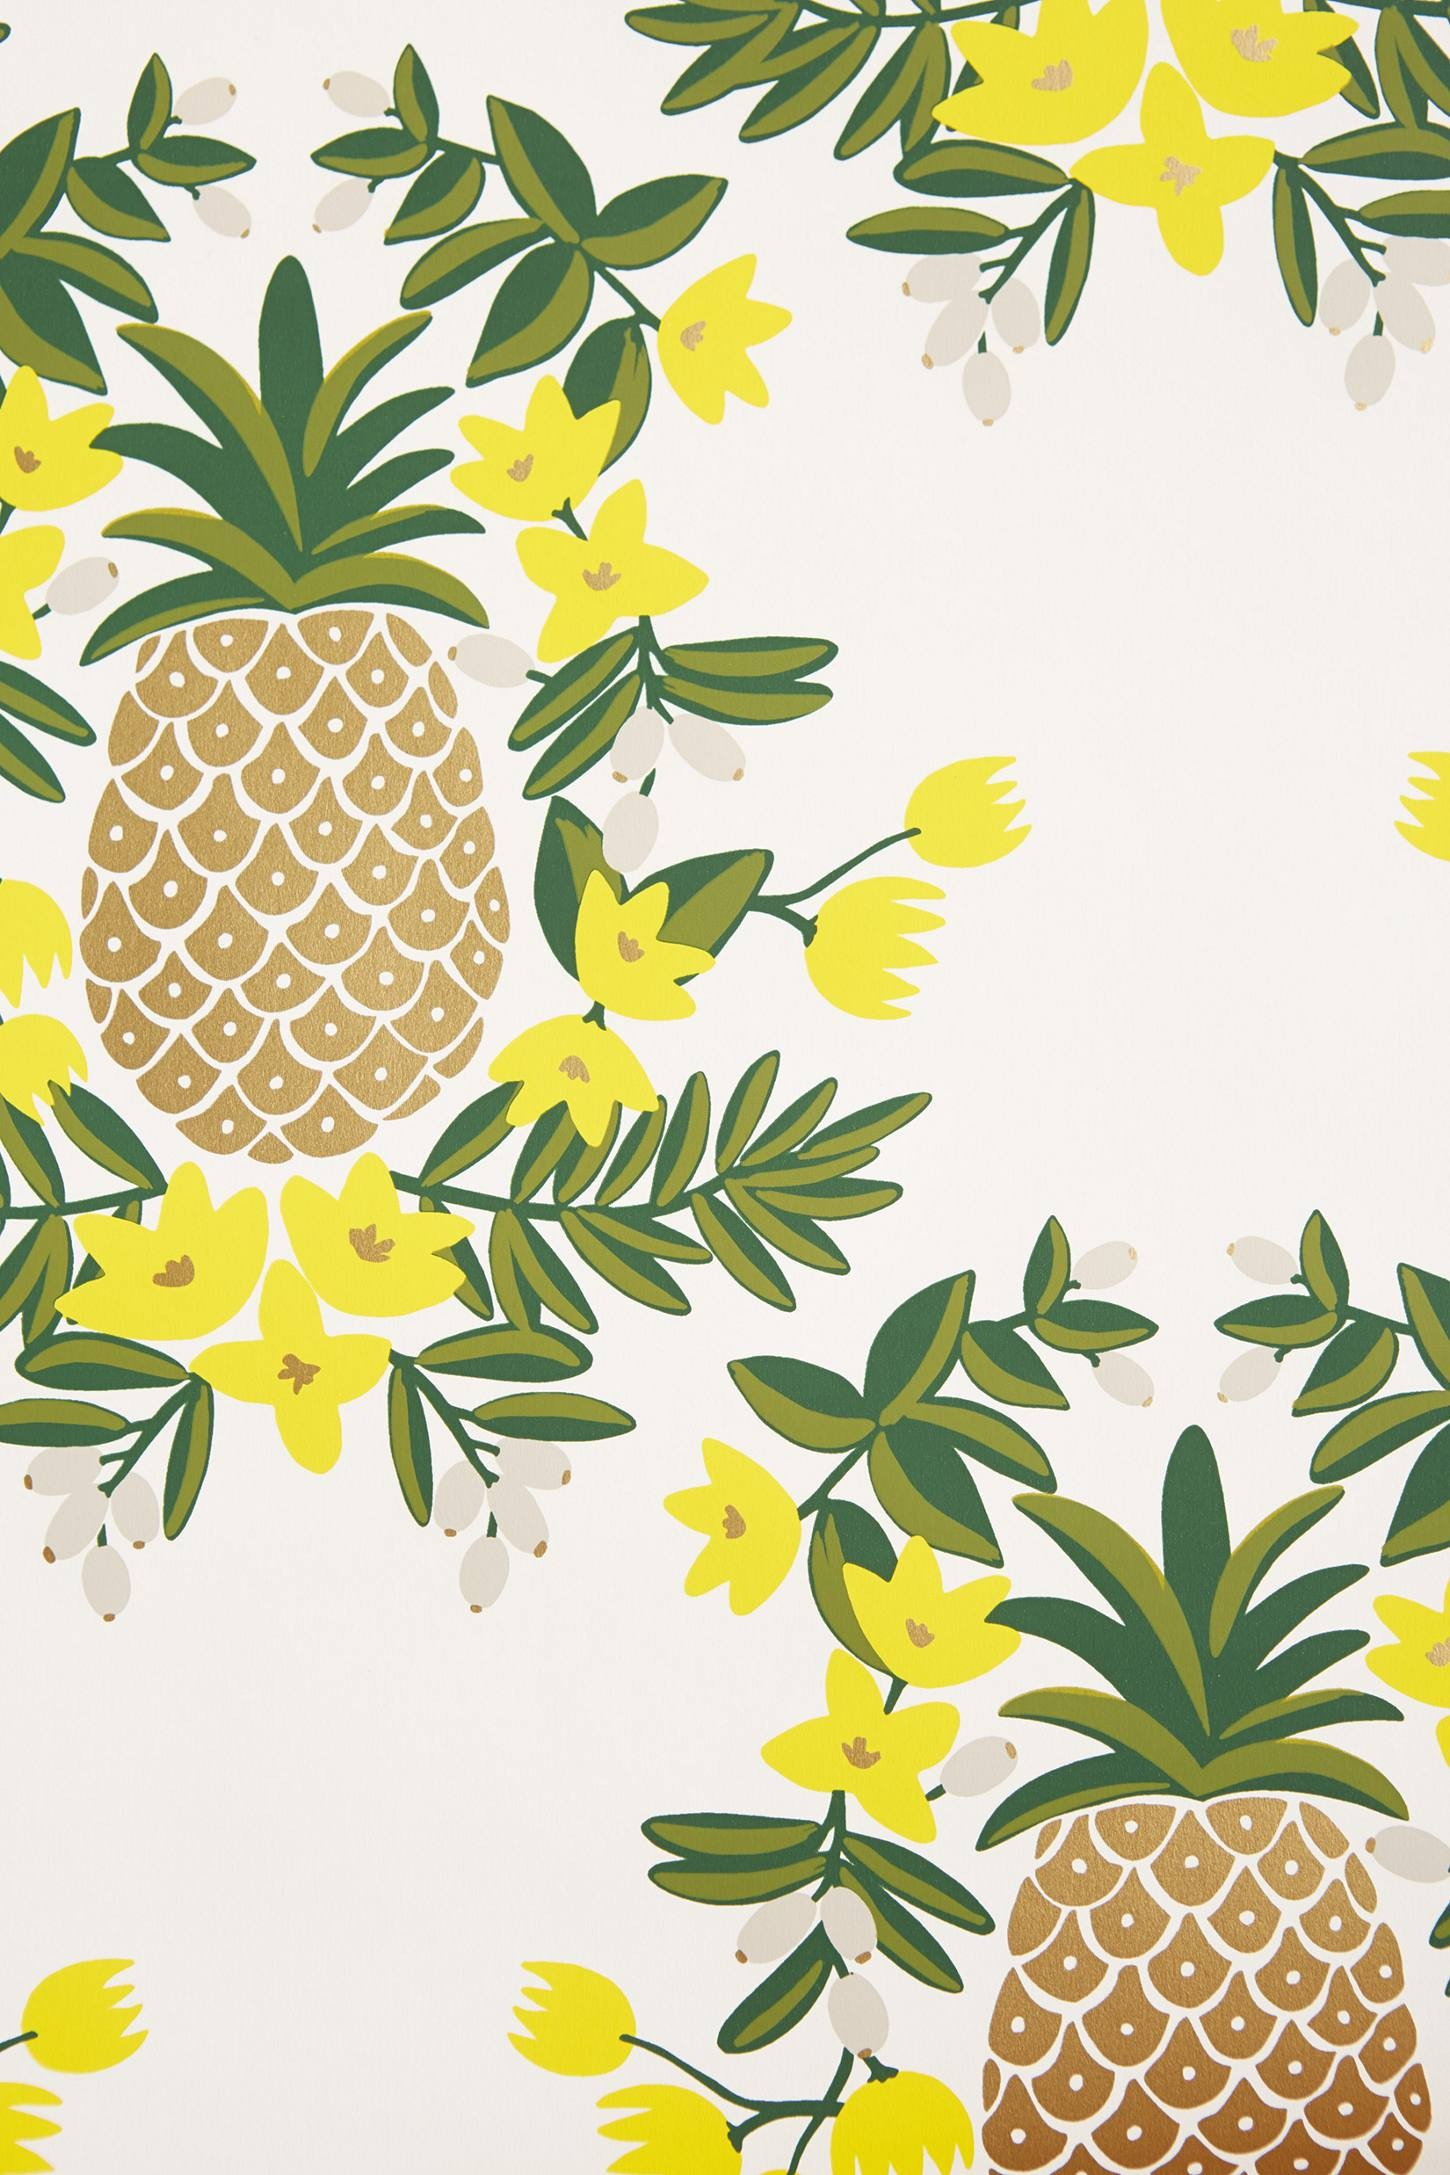 Pineapple wallpaper pineapple wallpaper by mindthegap Kitchen screensaver